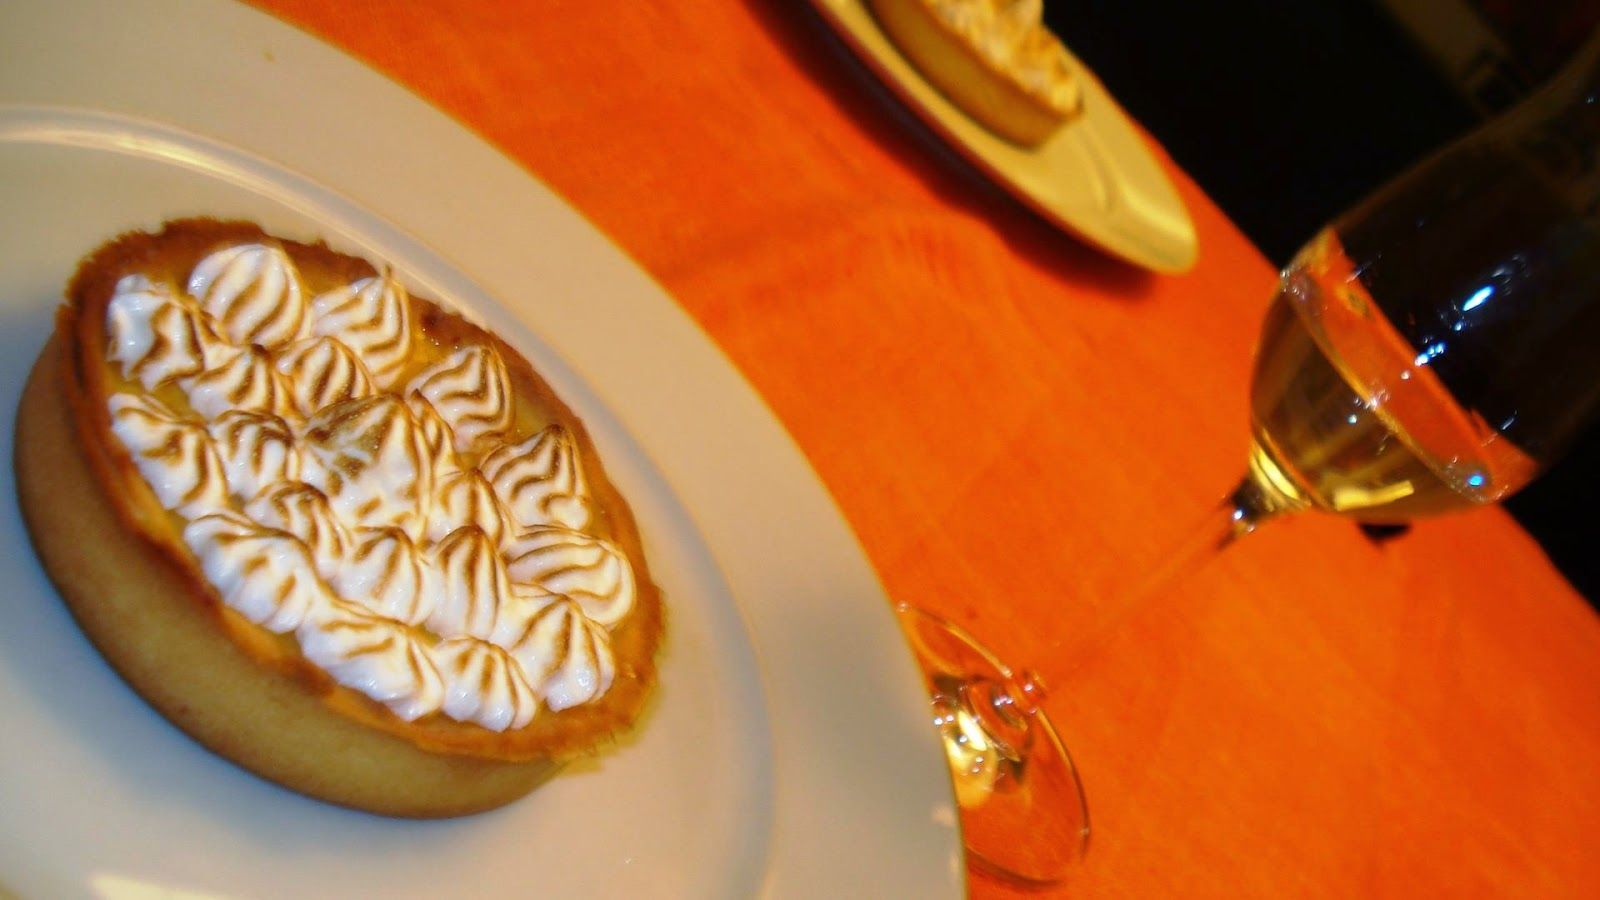 Taste Advisor: Είναι η ώρα του λεμονιού και δεν κρατιέμαι!